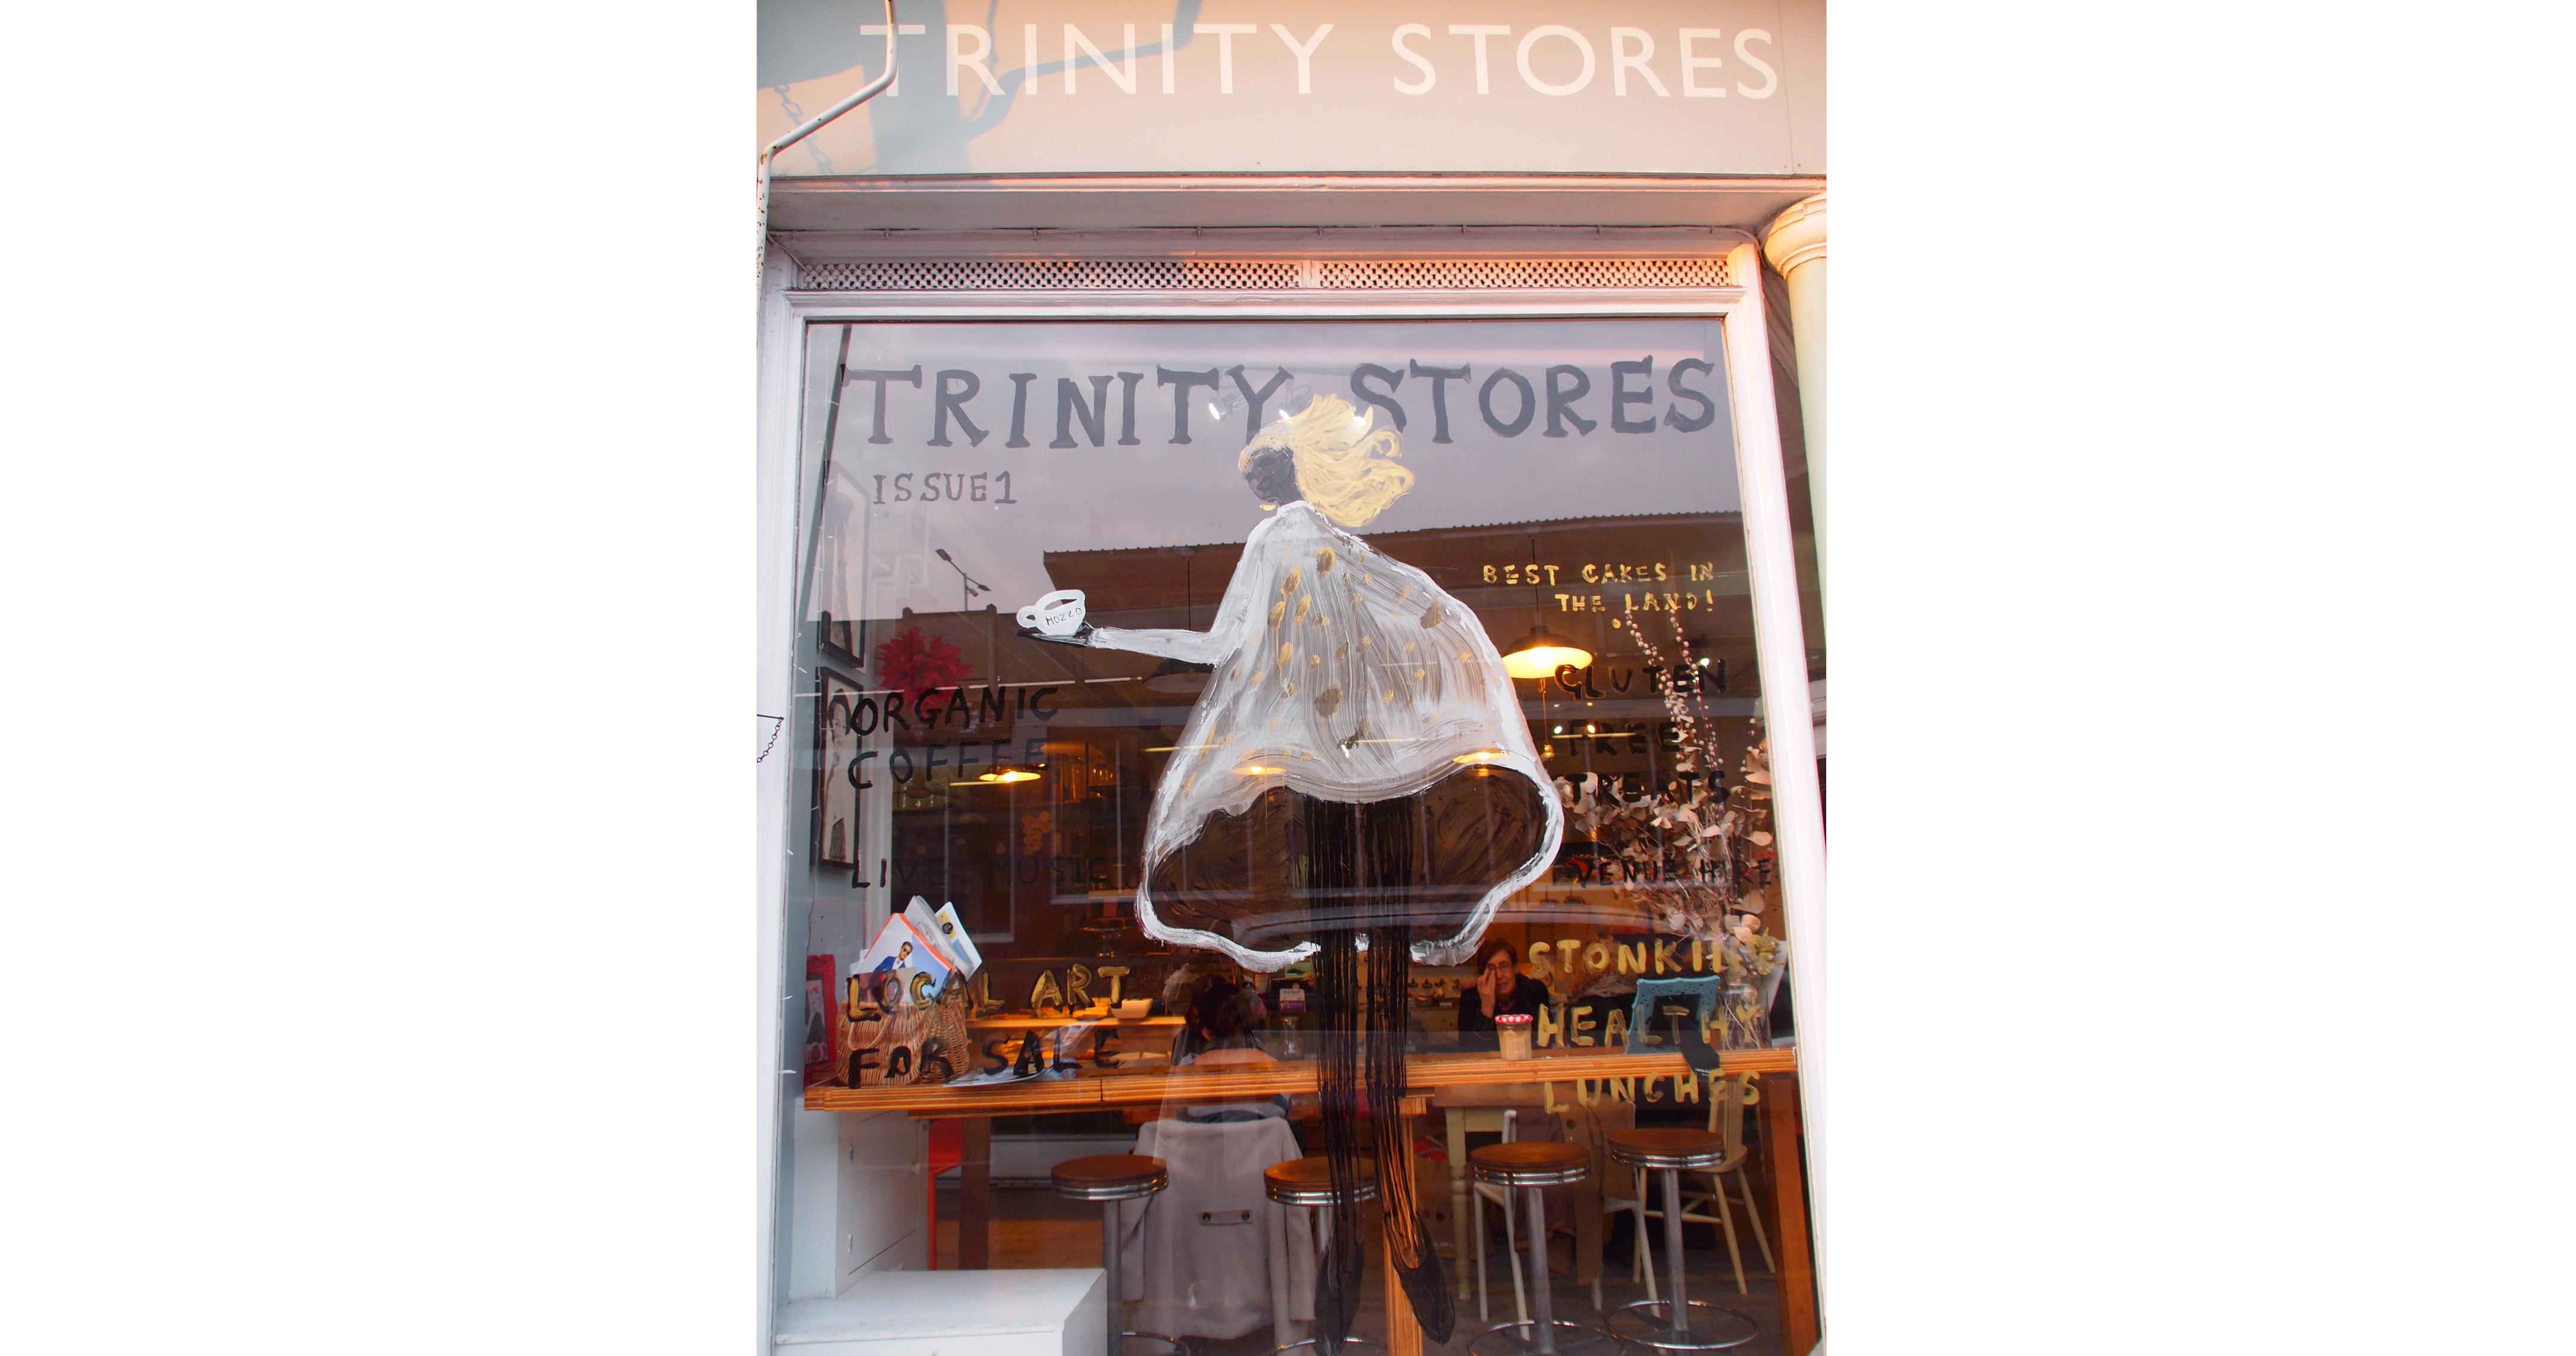 Trinity Stores